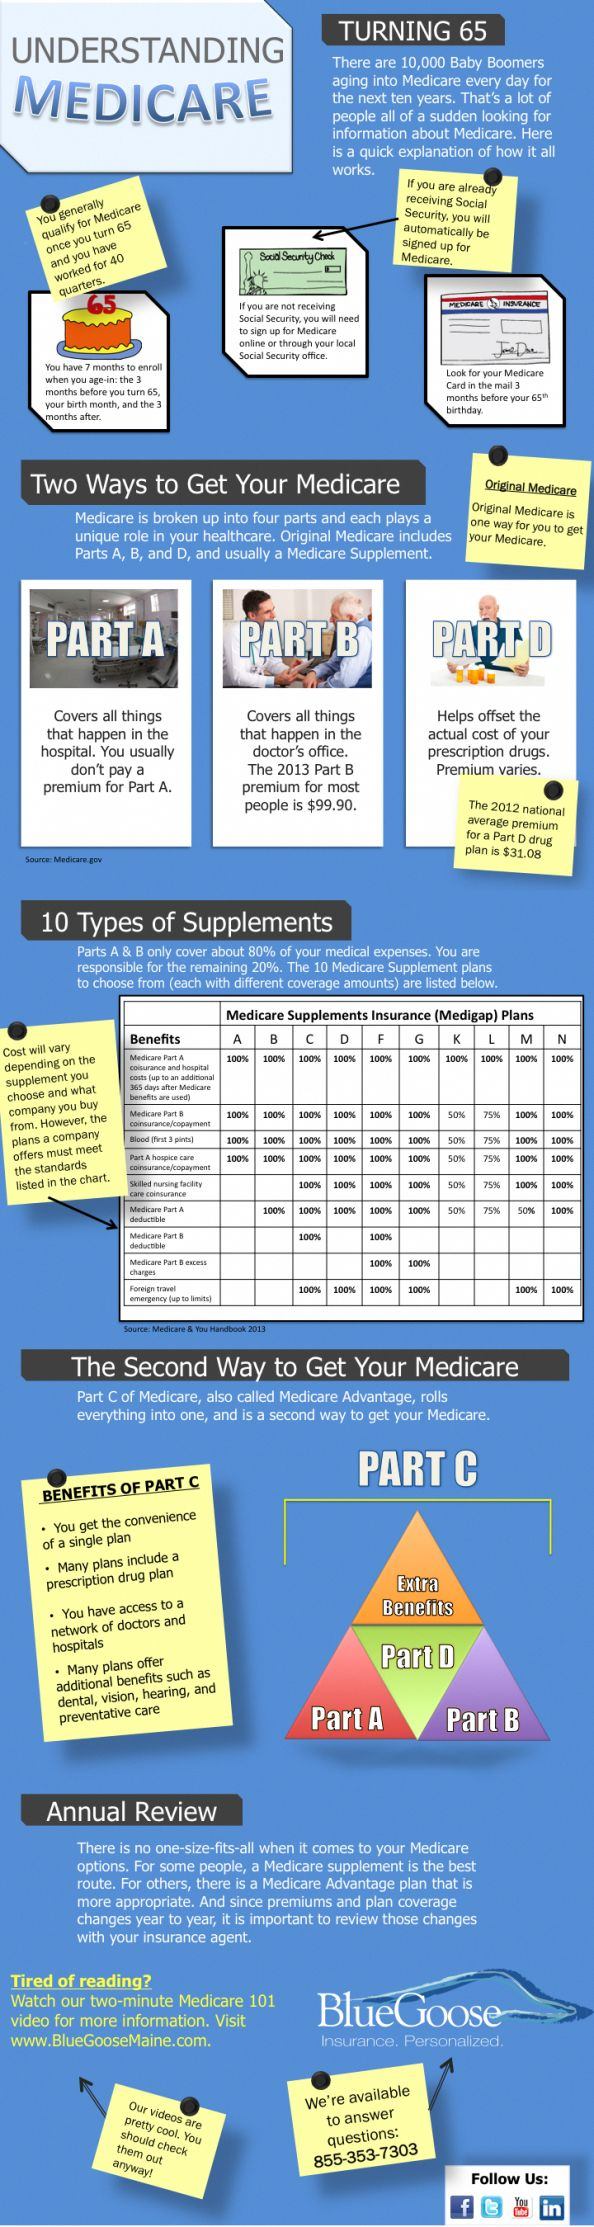 Medicare Enrollment Guide Infographic eTeleQuote